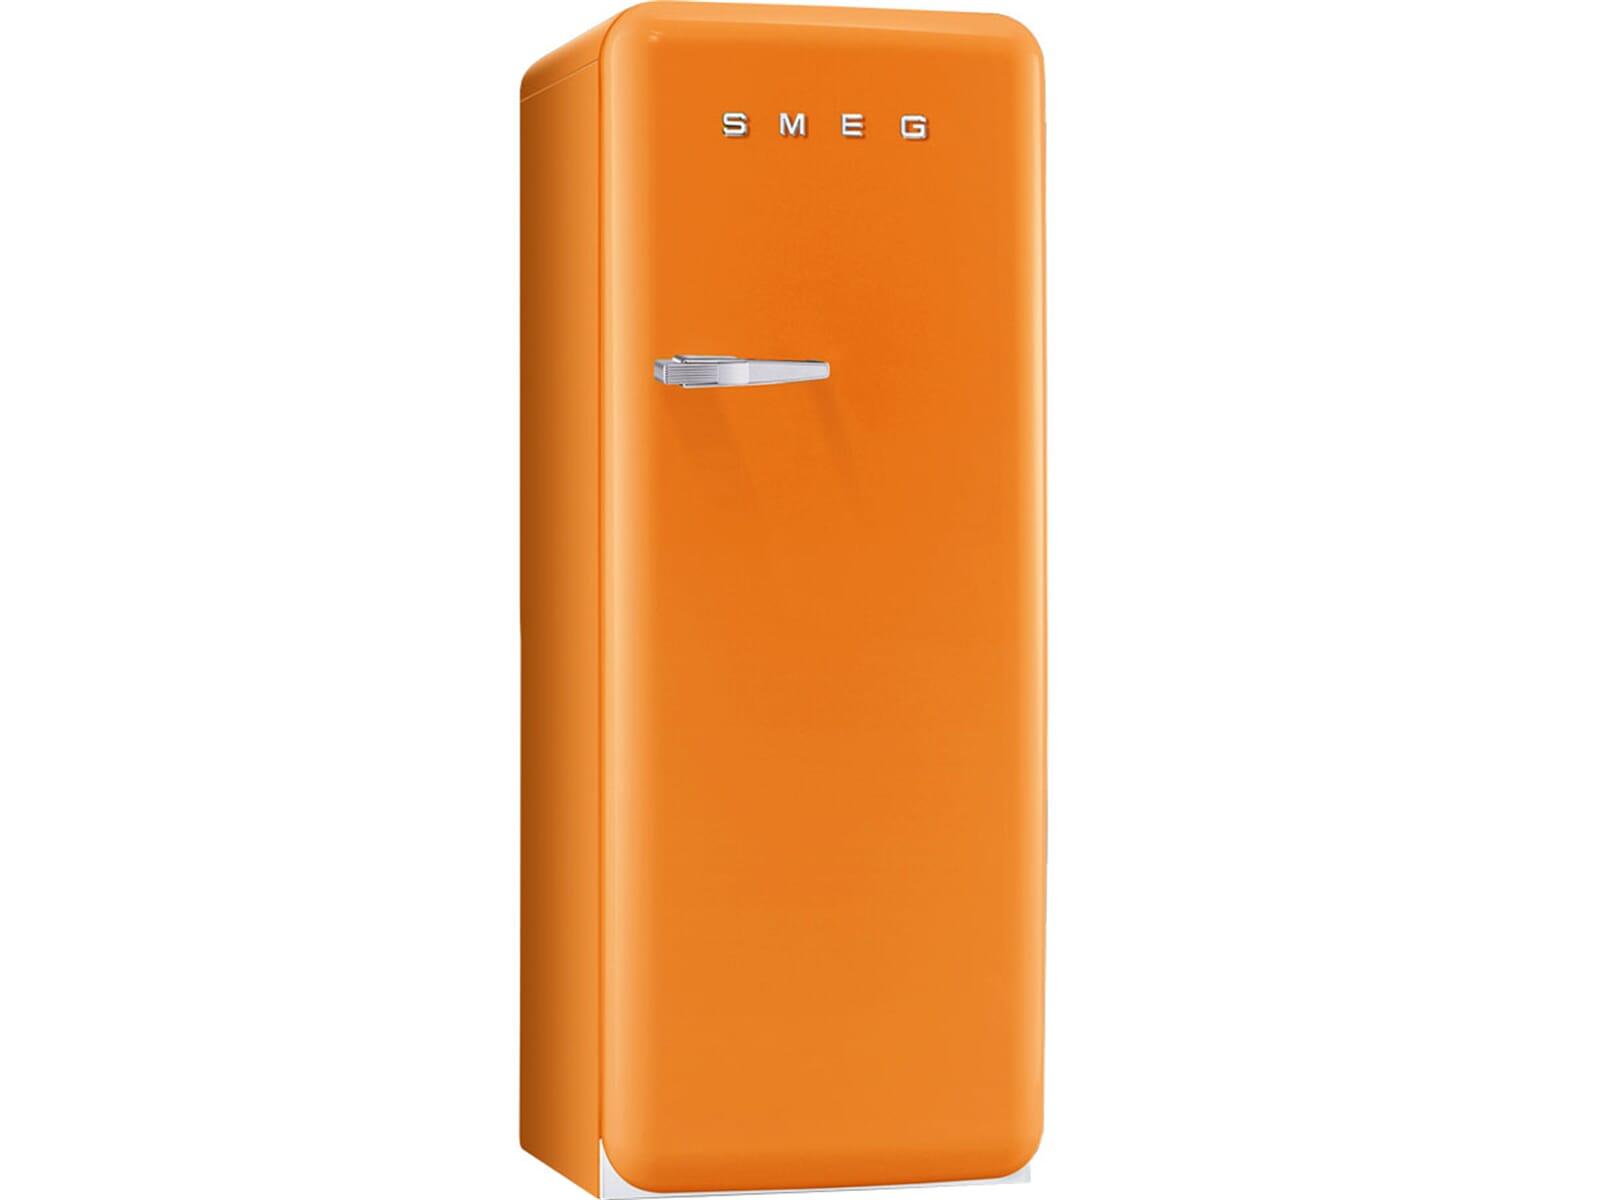 Smeg Kühlschrank Preise : Smeg kühlschrank günstig smeg scd imx kombi standherd